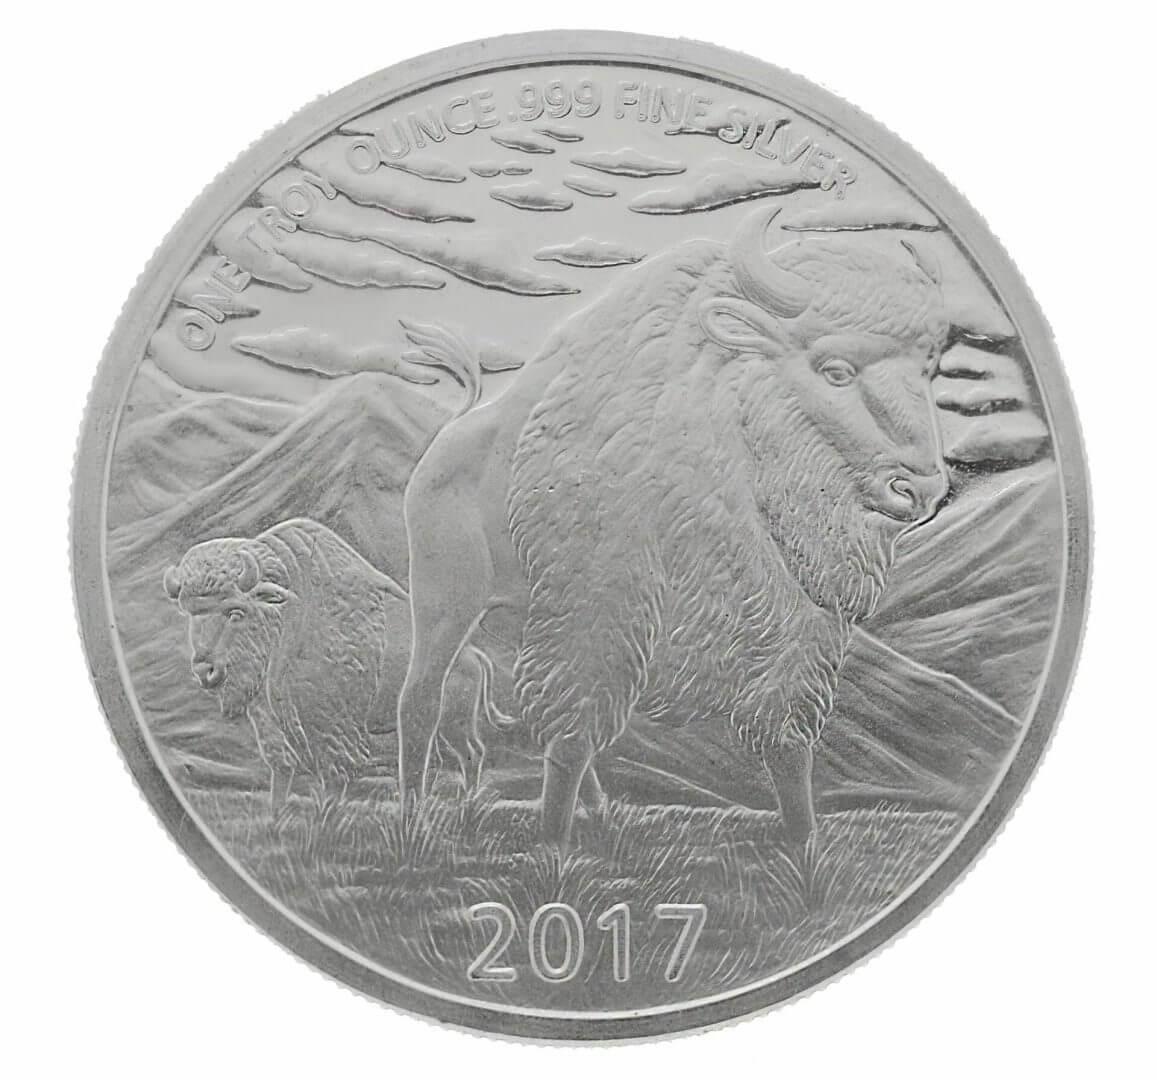 2017 The Hunter 1oz Silver Bullion Coin 2